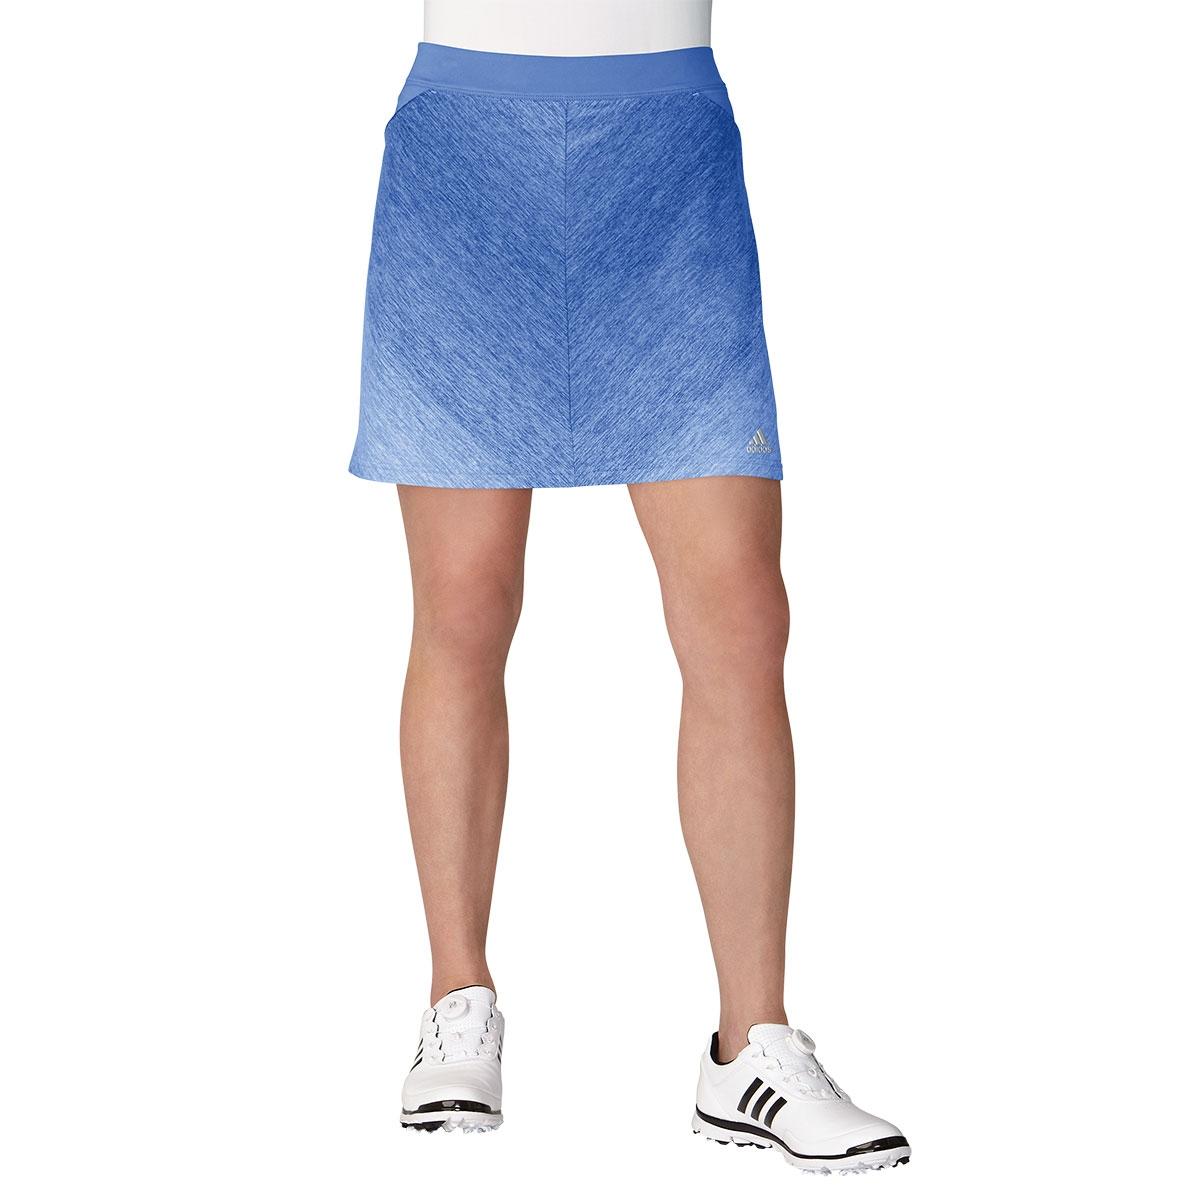 Adidas Womens Rangewear A Line Skort - Blue